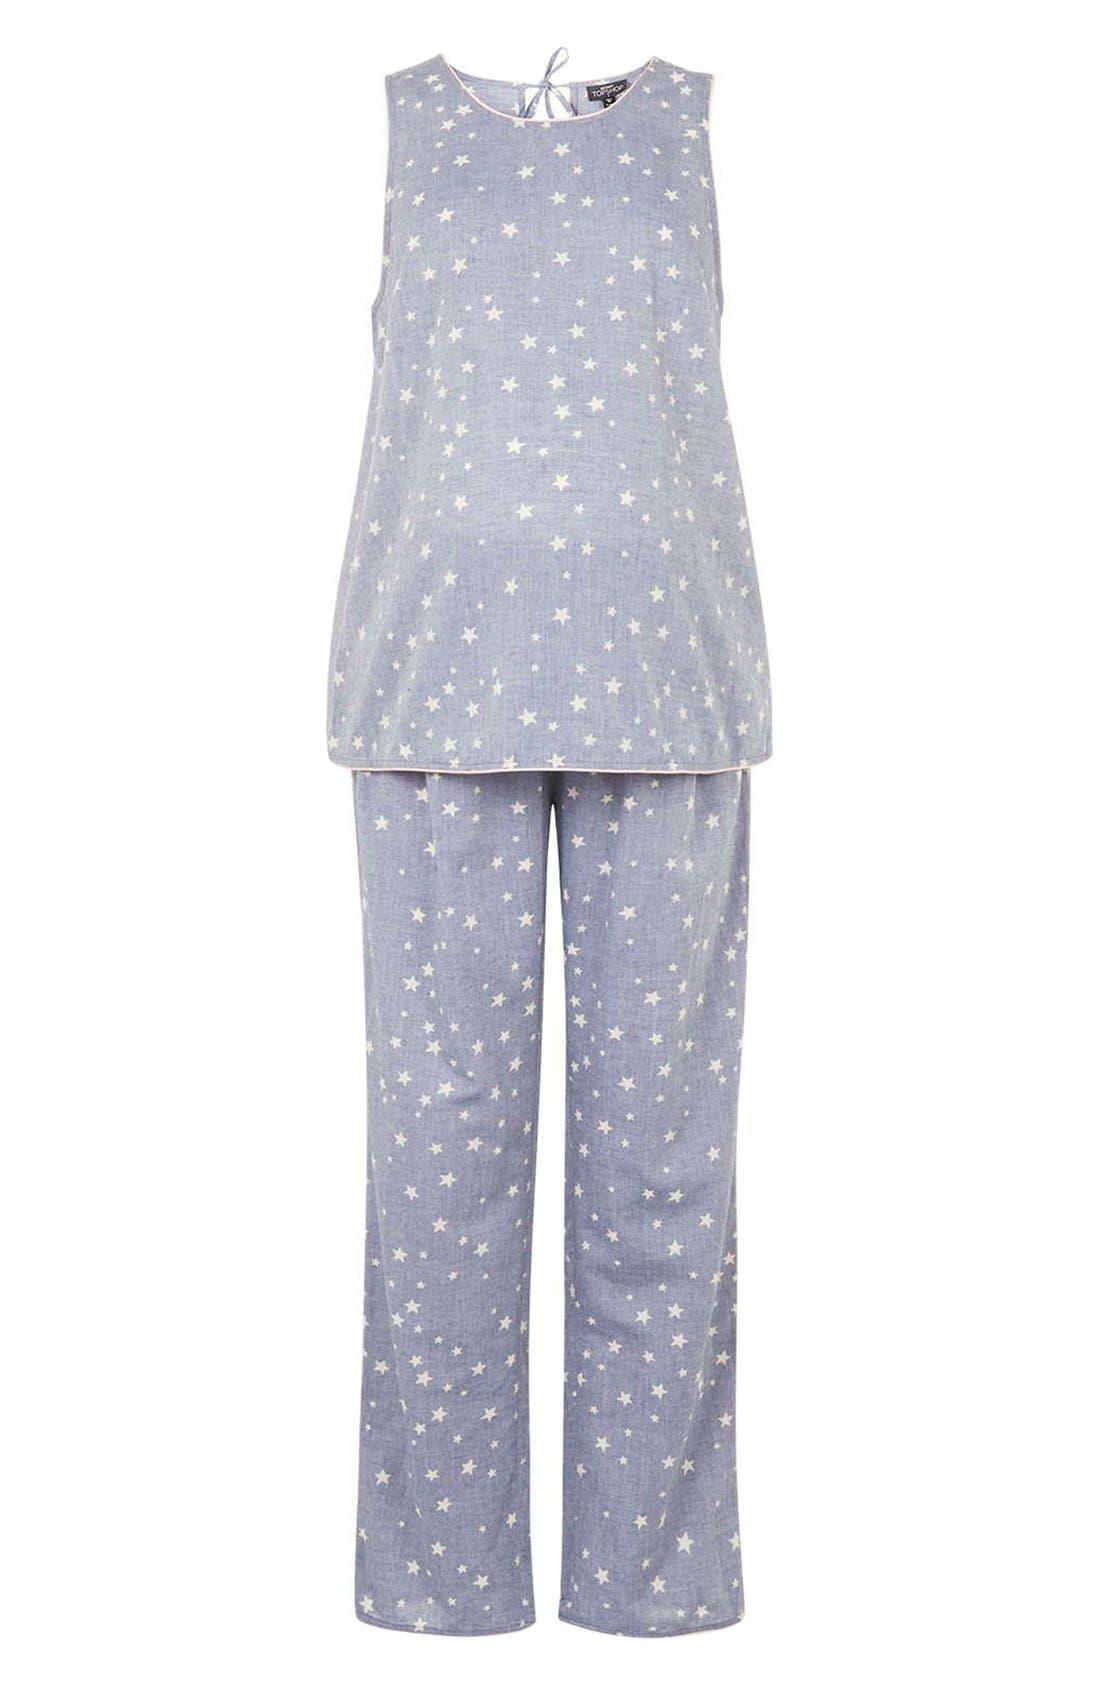 Alternate Image 1 Selected - Topshop'Mischa' Star Print MaternityPajamas